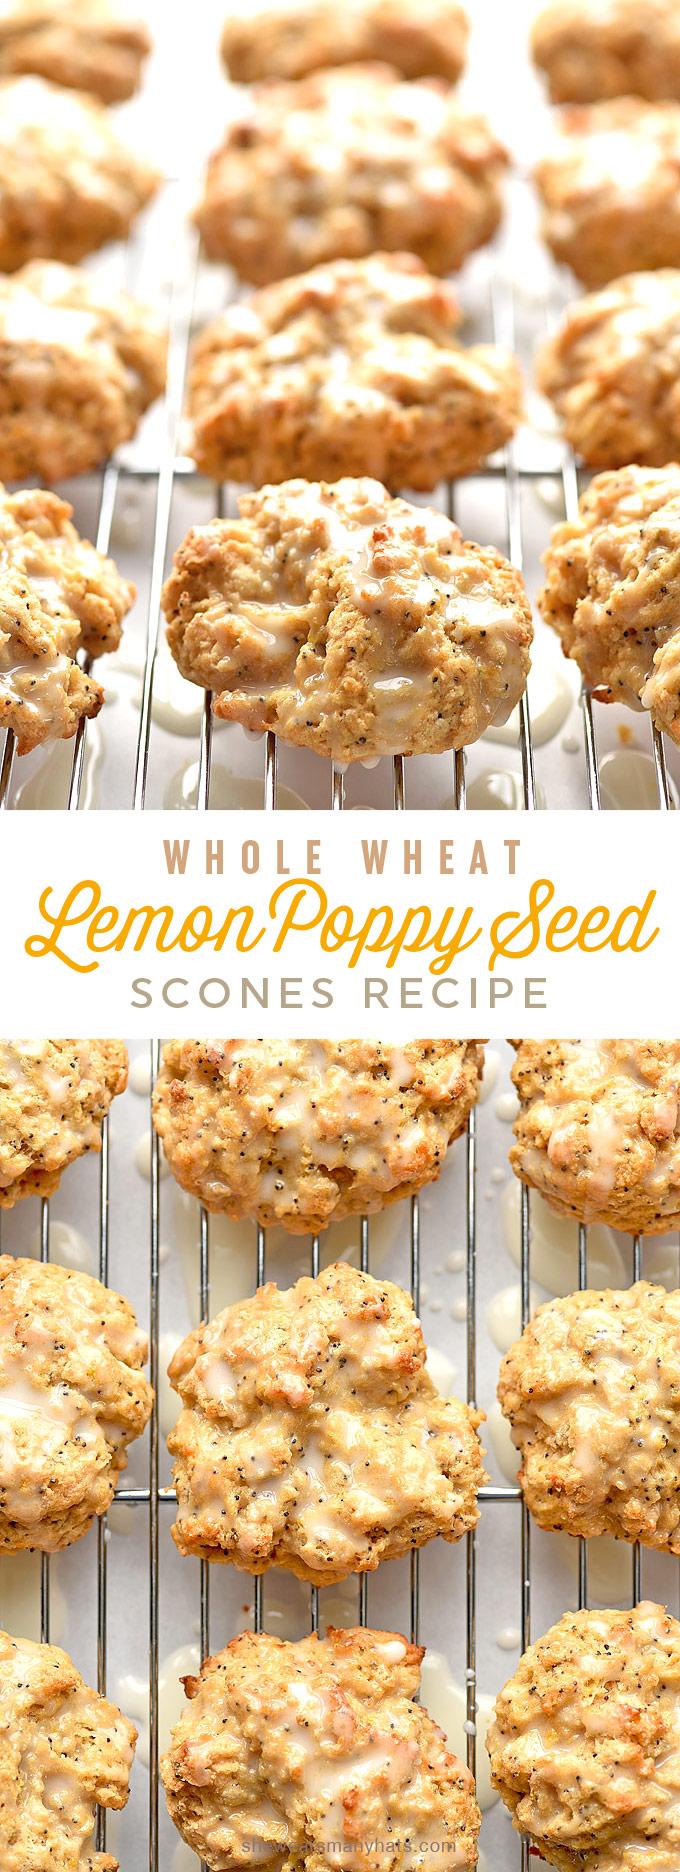 Whole Wheat Lemon Poppyseed Scones Recipe with Lemon Glaze | shewearsmanyhats.com